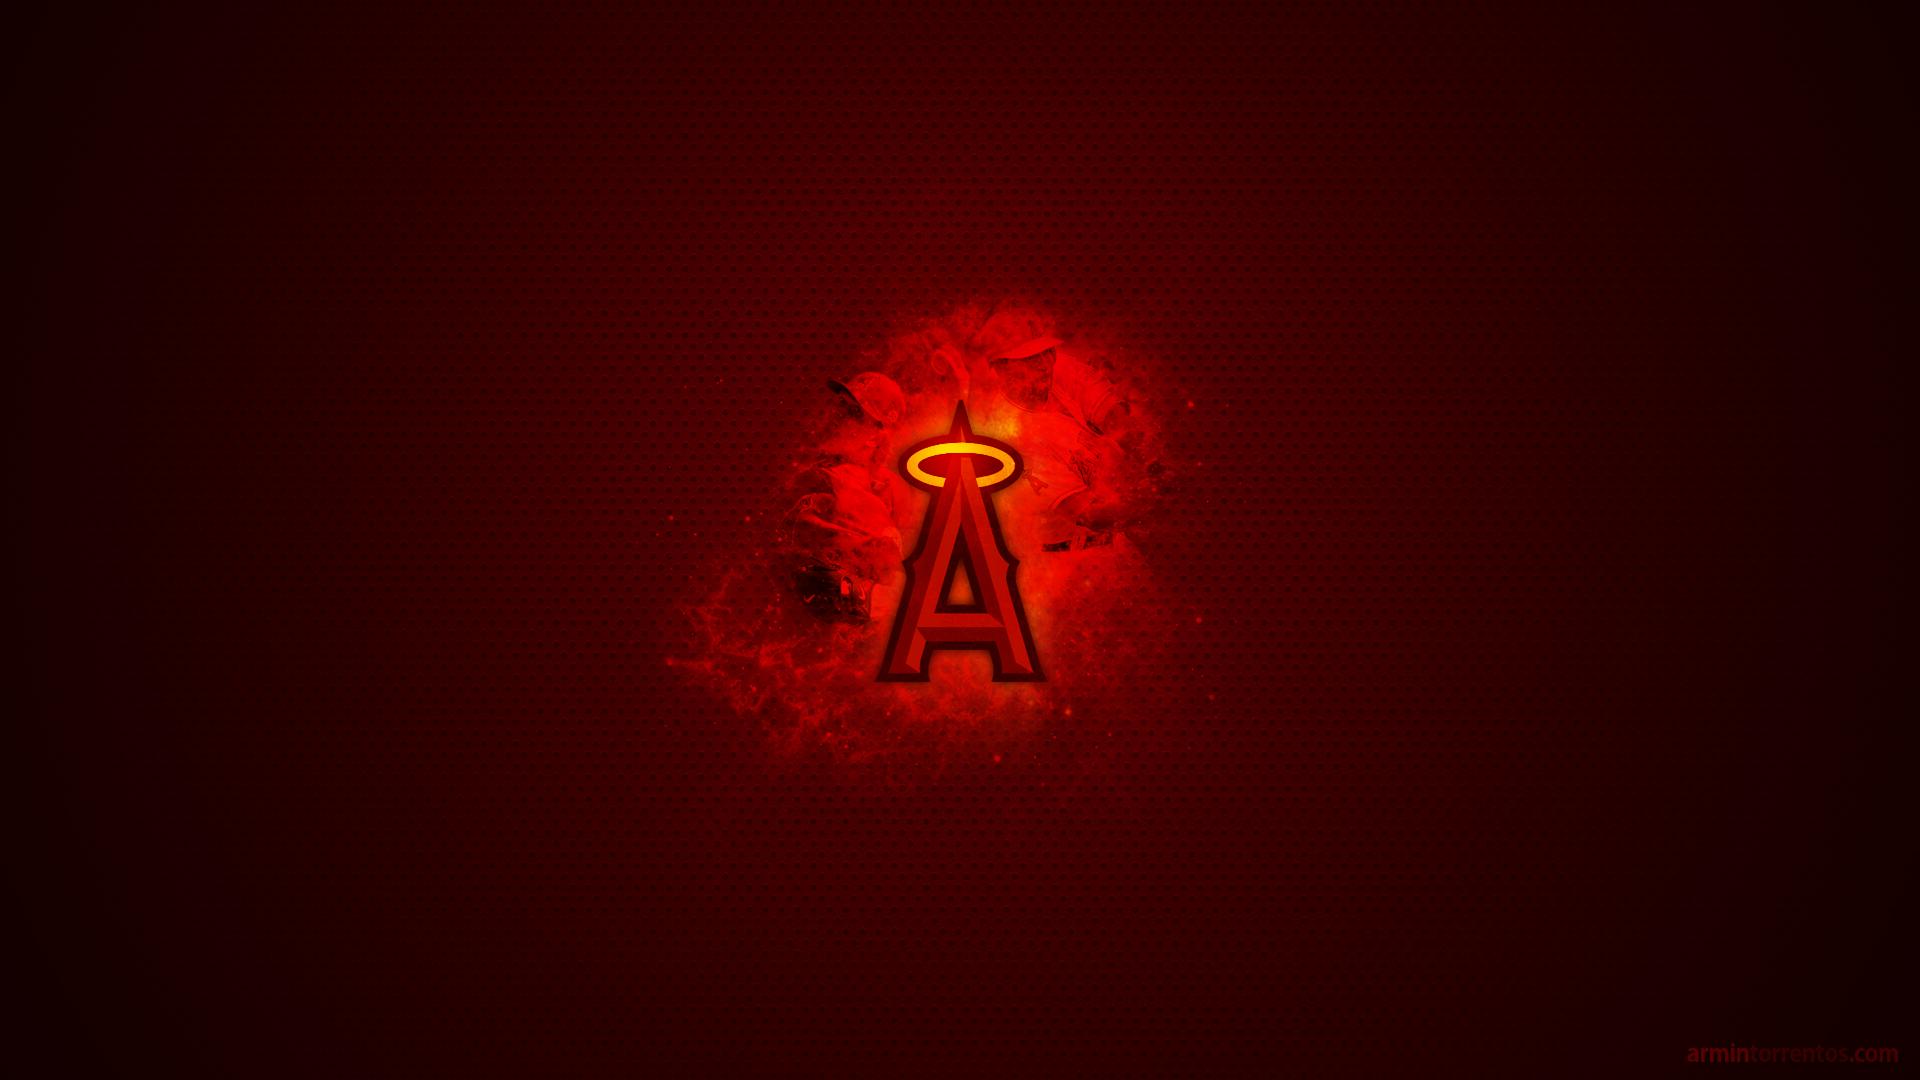 los angeles angels wallpaper iphone 1920x1080